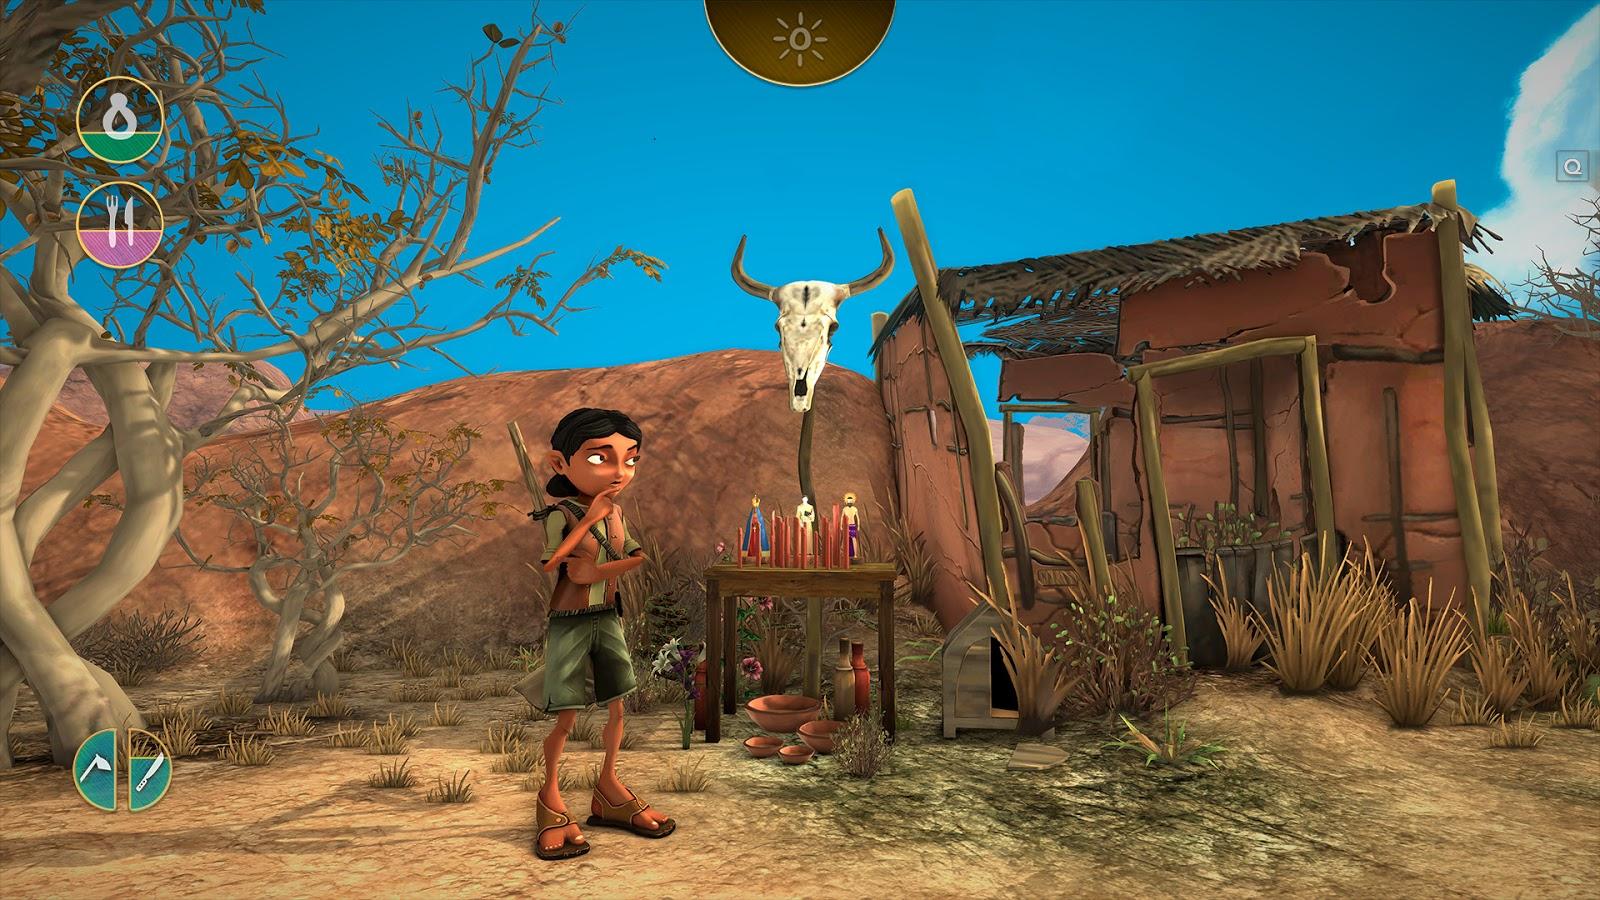 arida-backlands-awakening-pc-screenshot-04